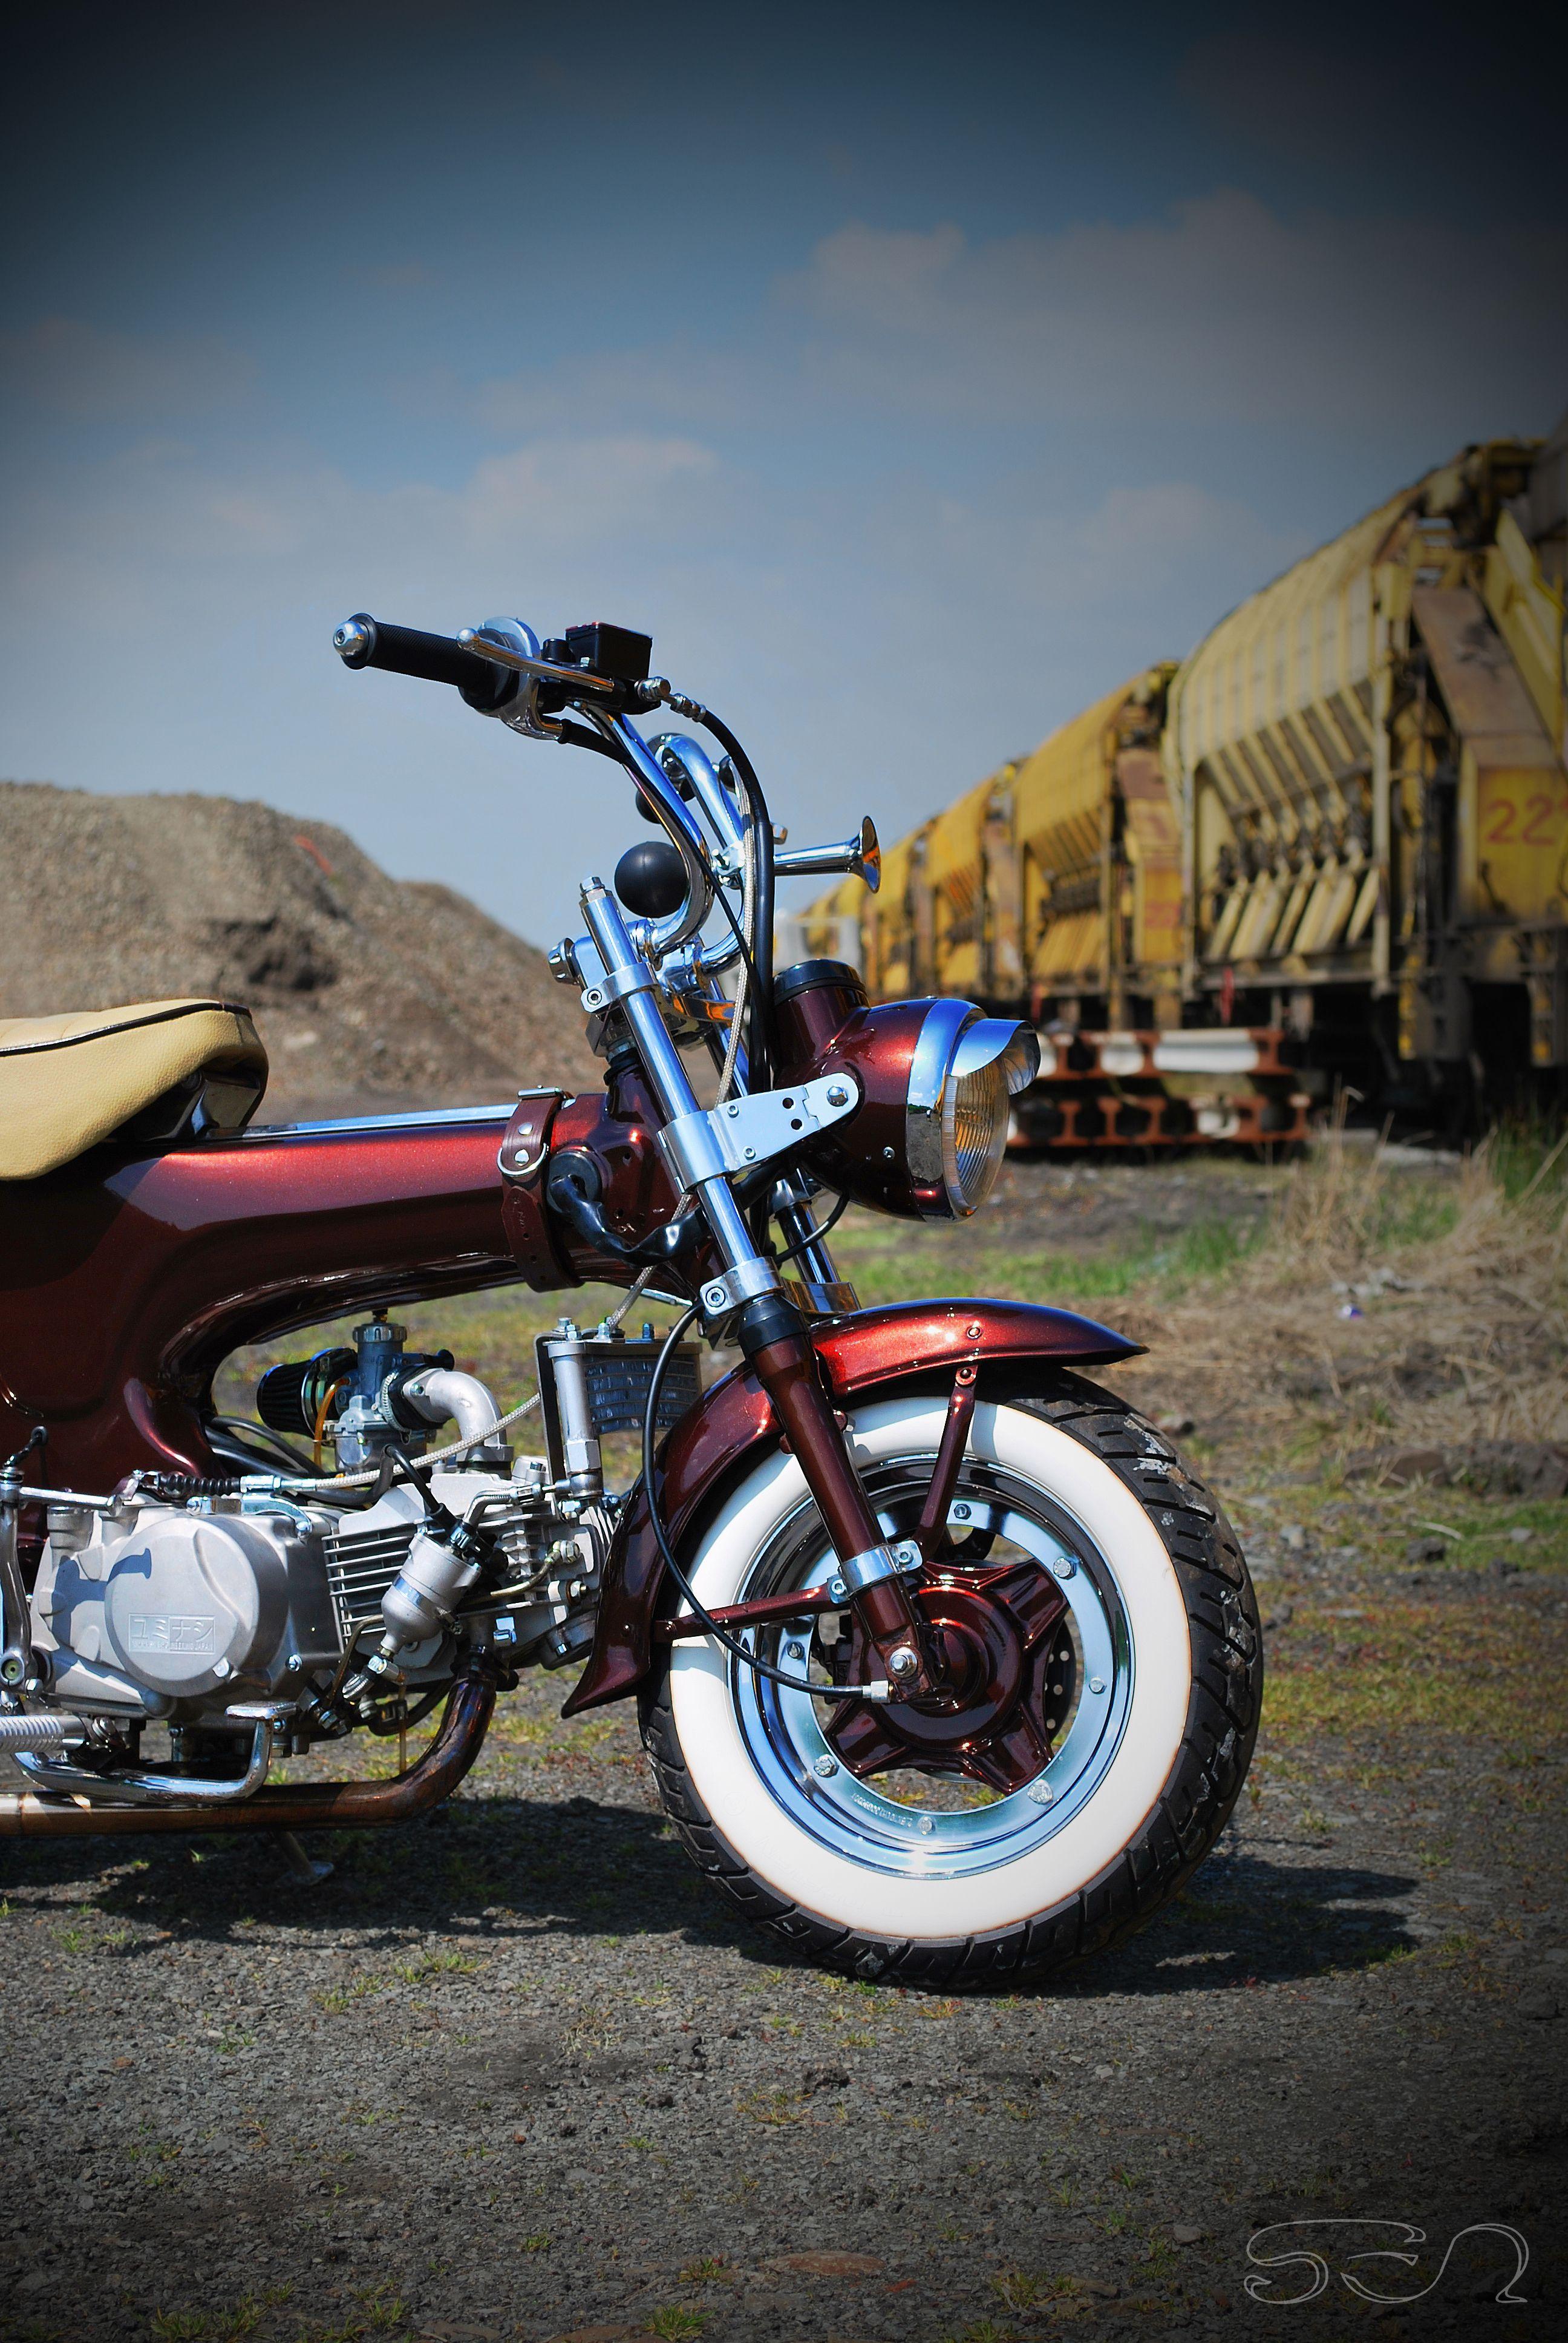 160cc mini bike from honda honda dax pinterest mini. Black Bedroom Furniture Sets. Home Design Ideas